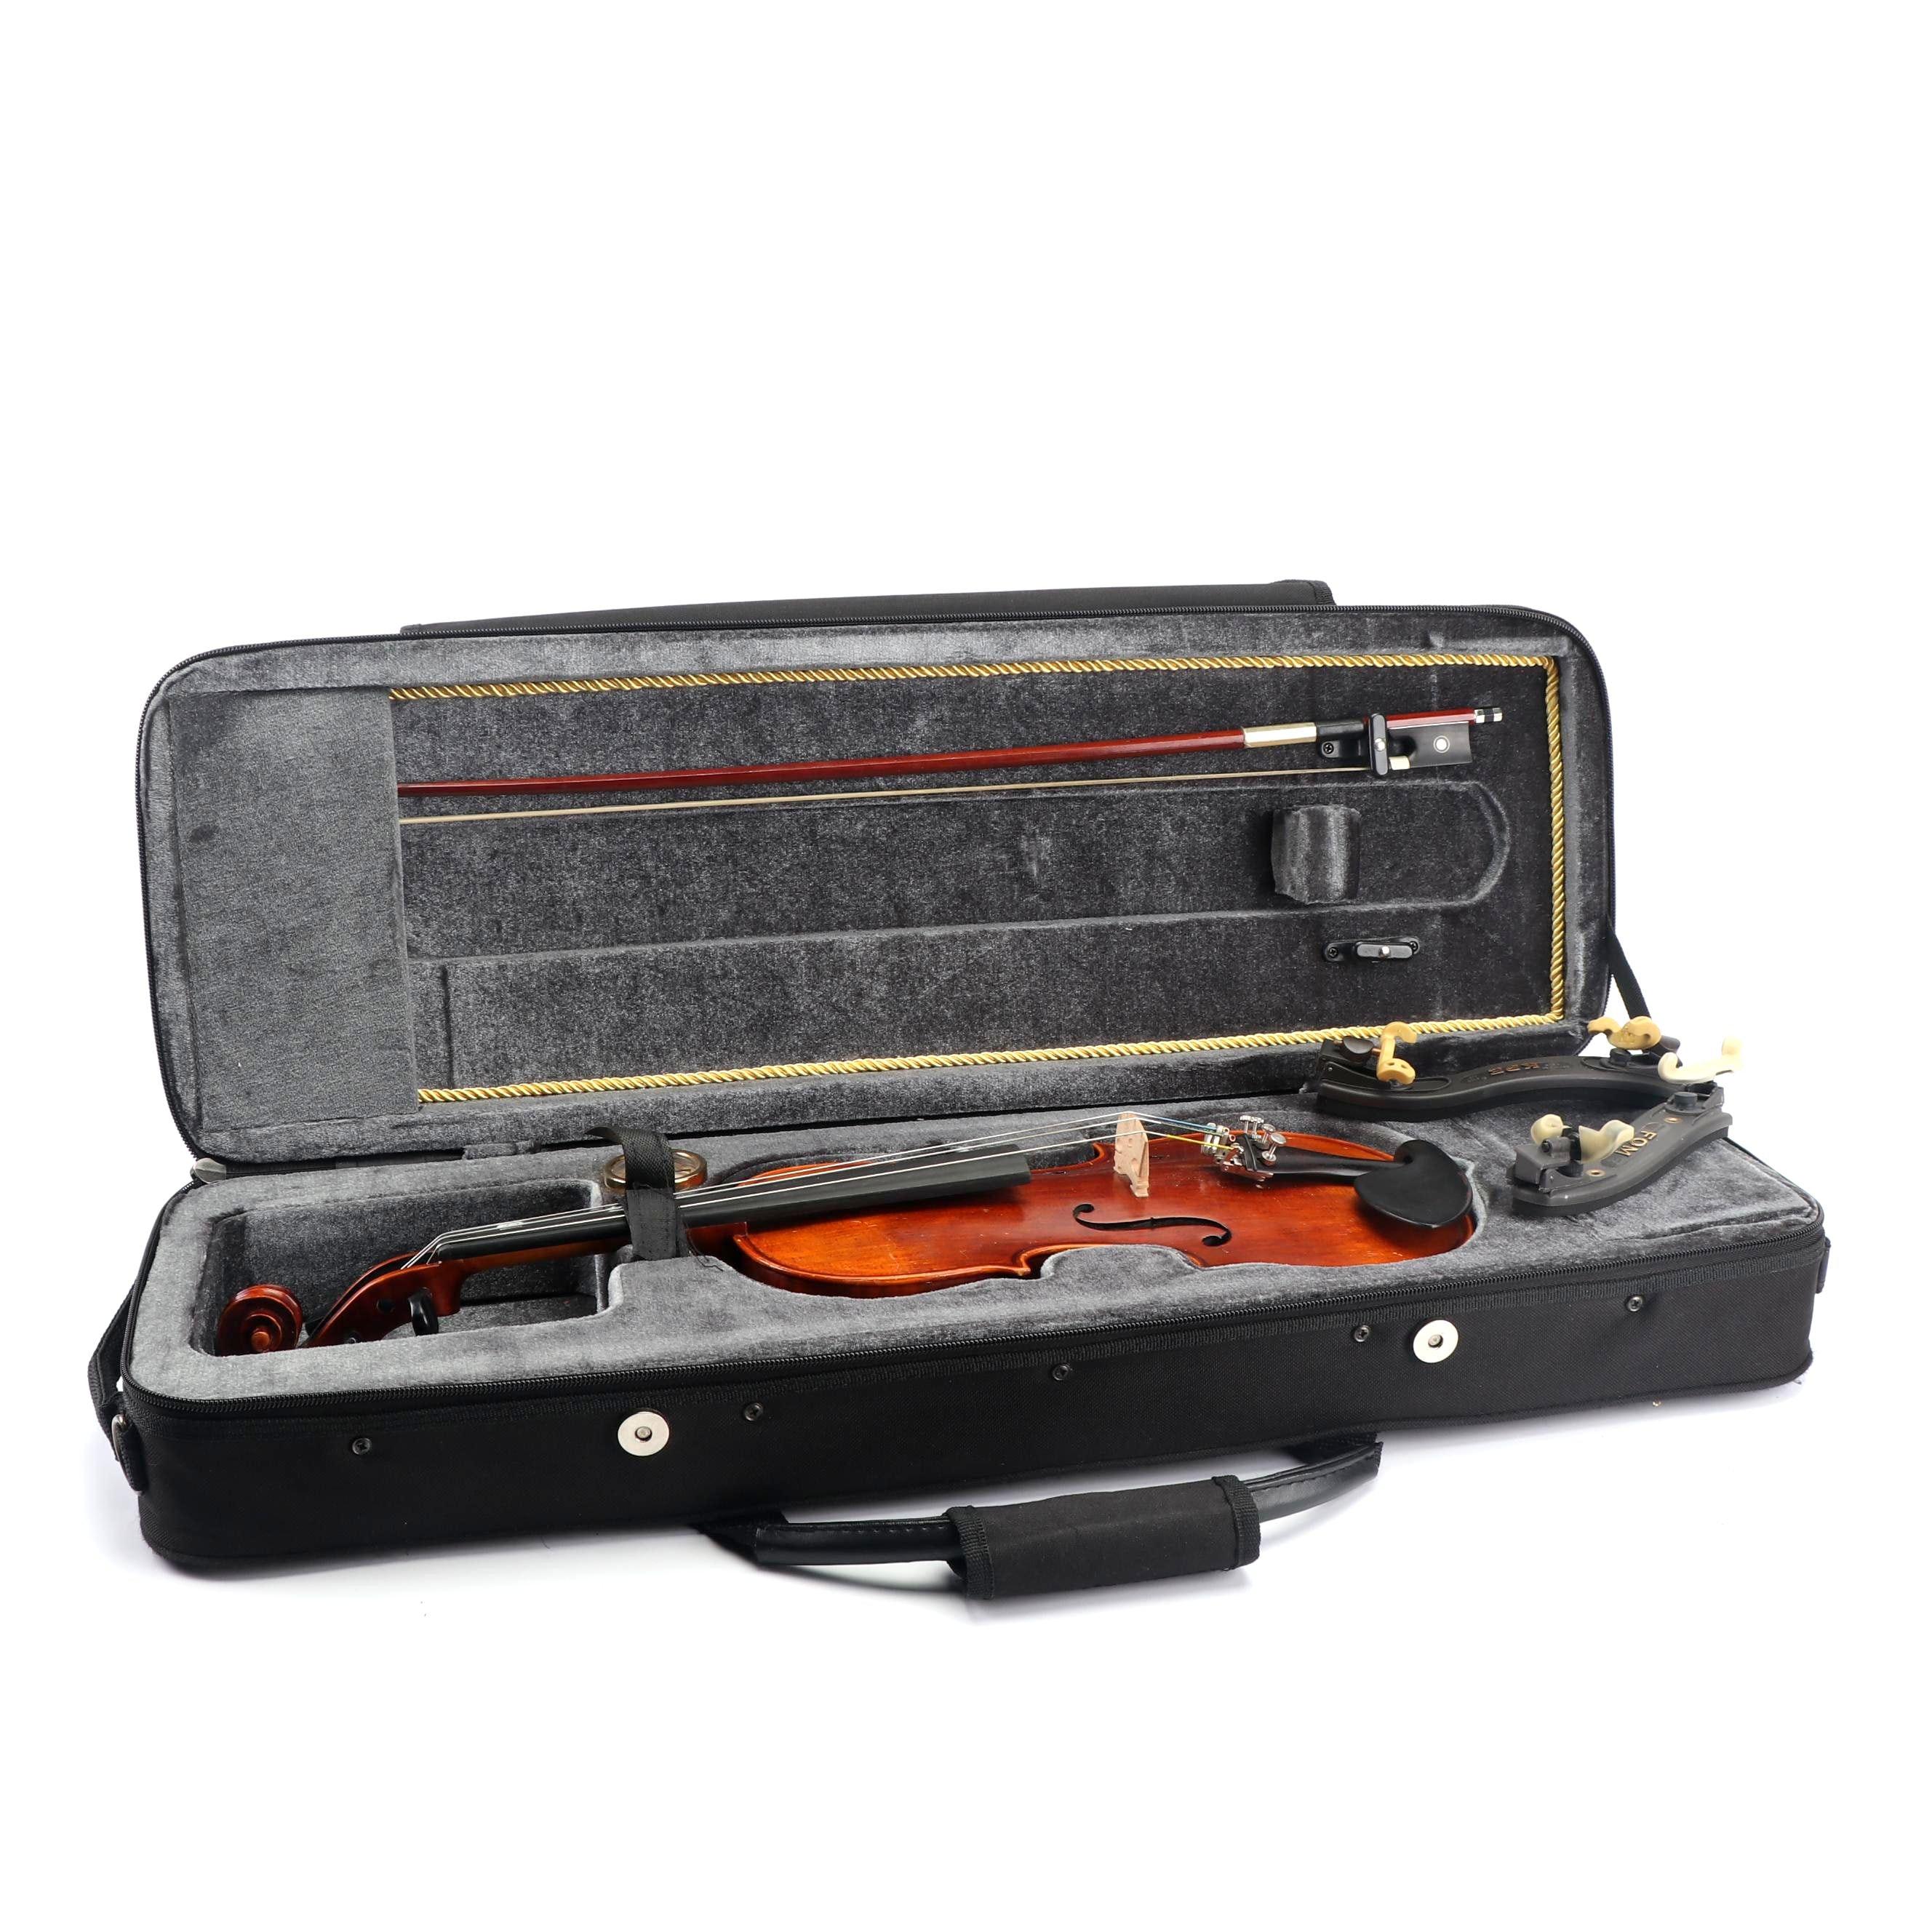 Antonio Bach 1/2 Violin with Bow and Case